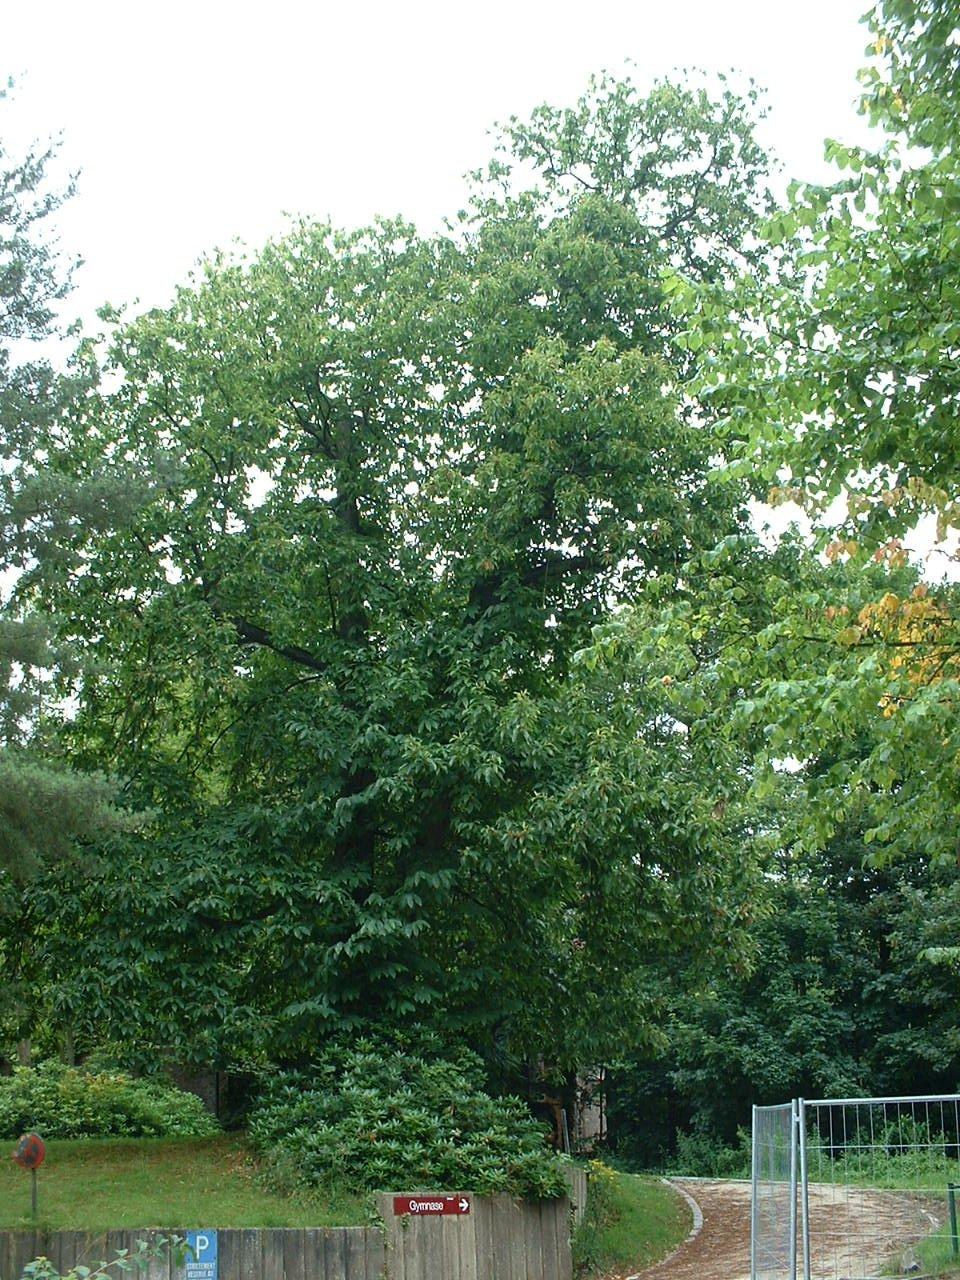 Châtaignier – Watermael-Boitsfort, Parc du Collège Saint-Hubert, Avenue Charle-Albert, 9 –  23 Juillet 2002